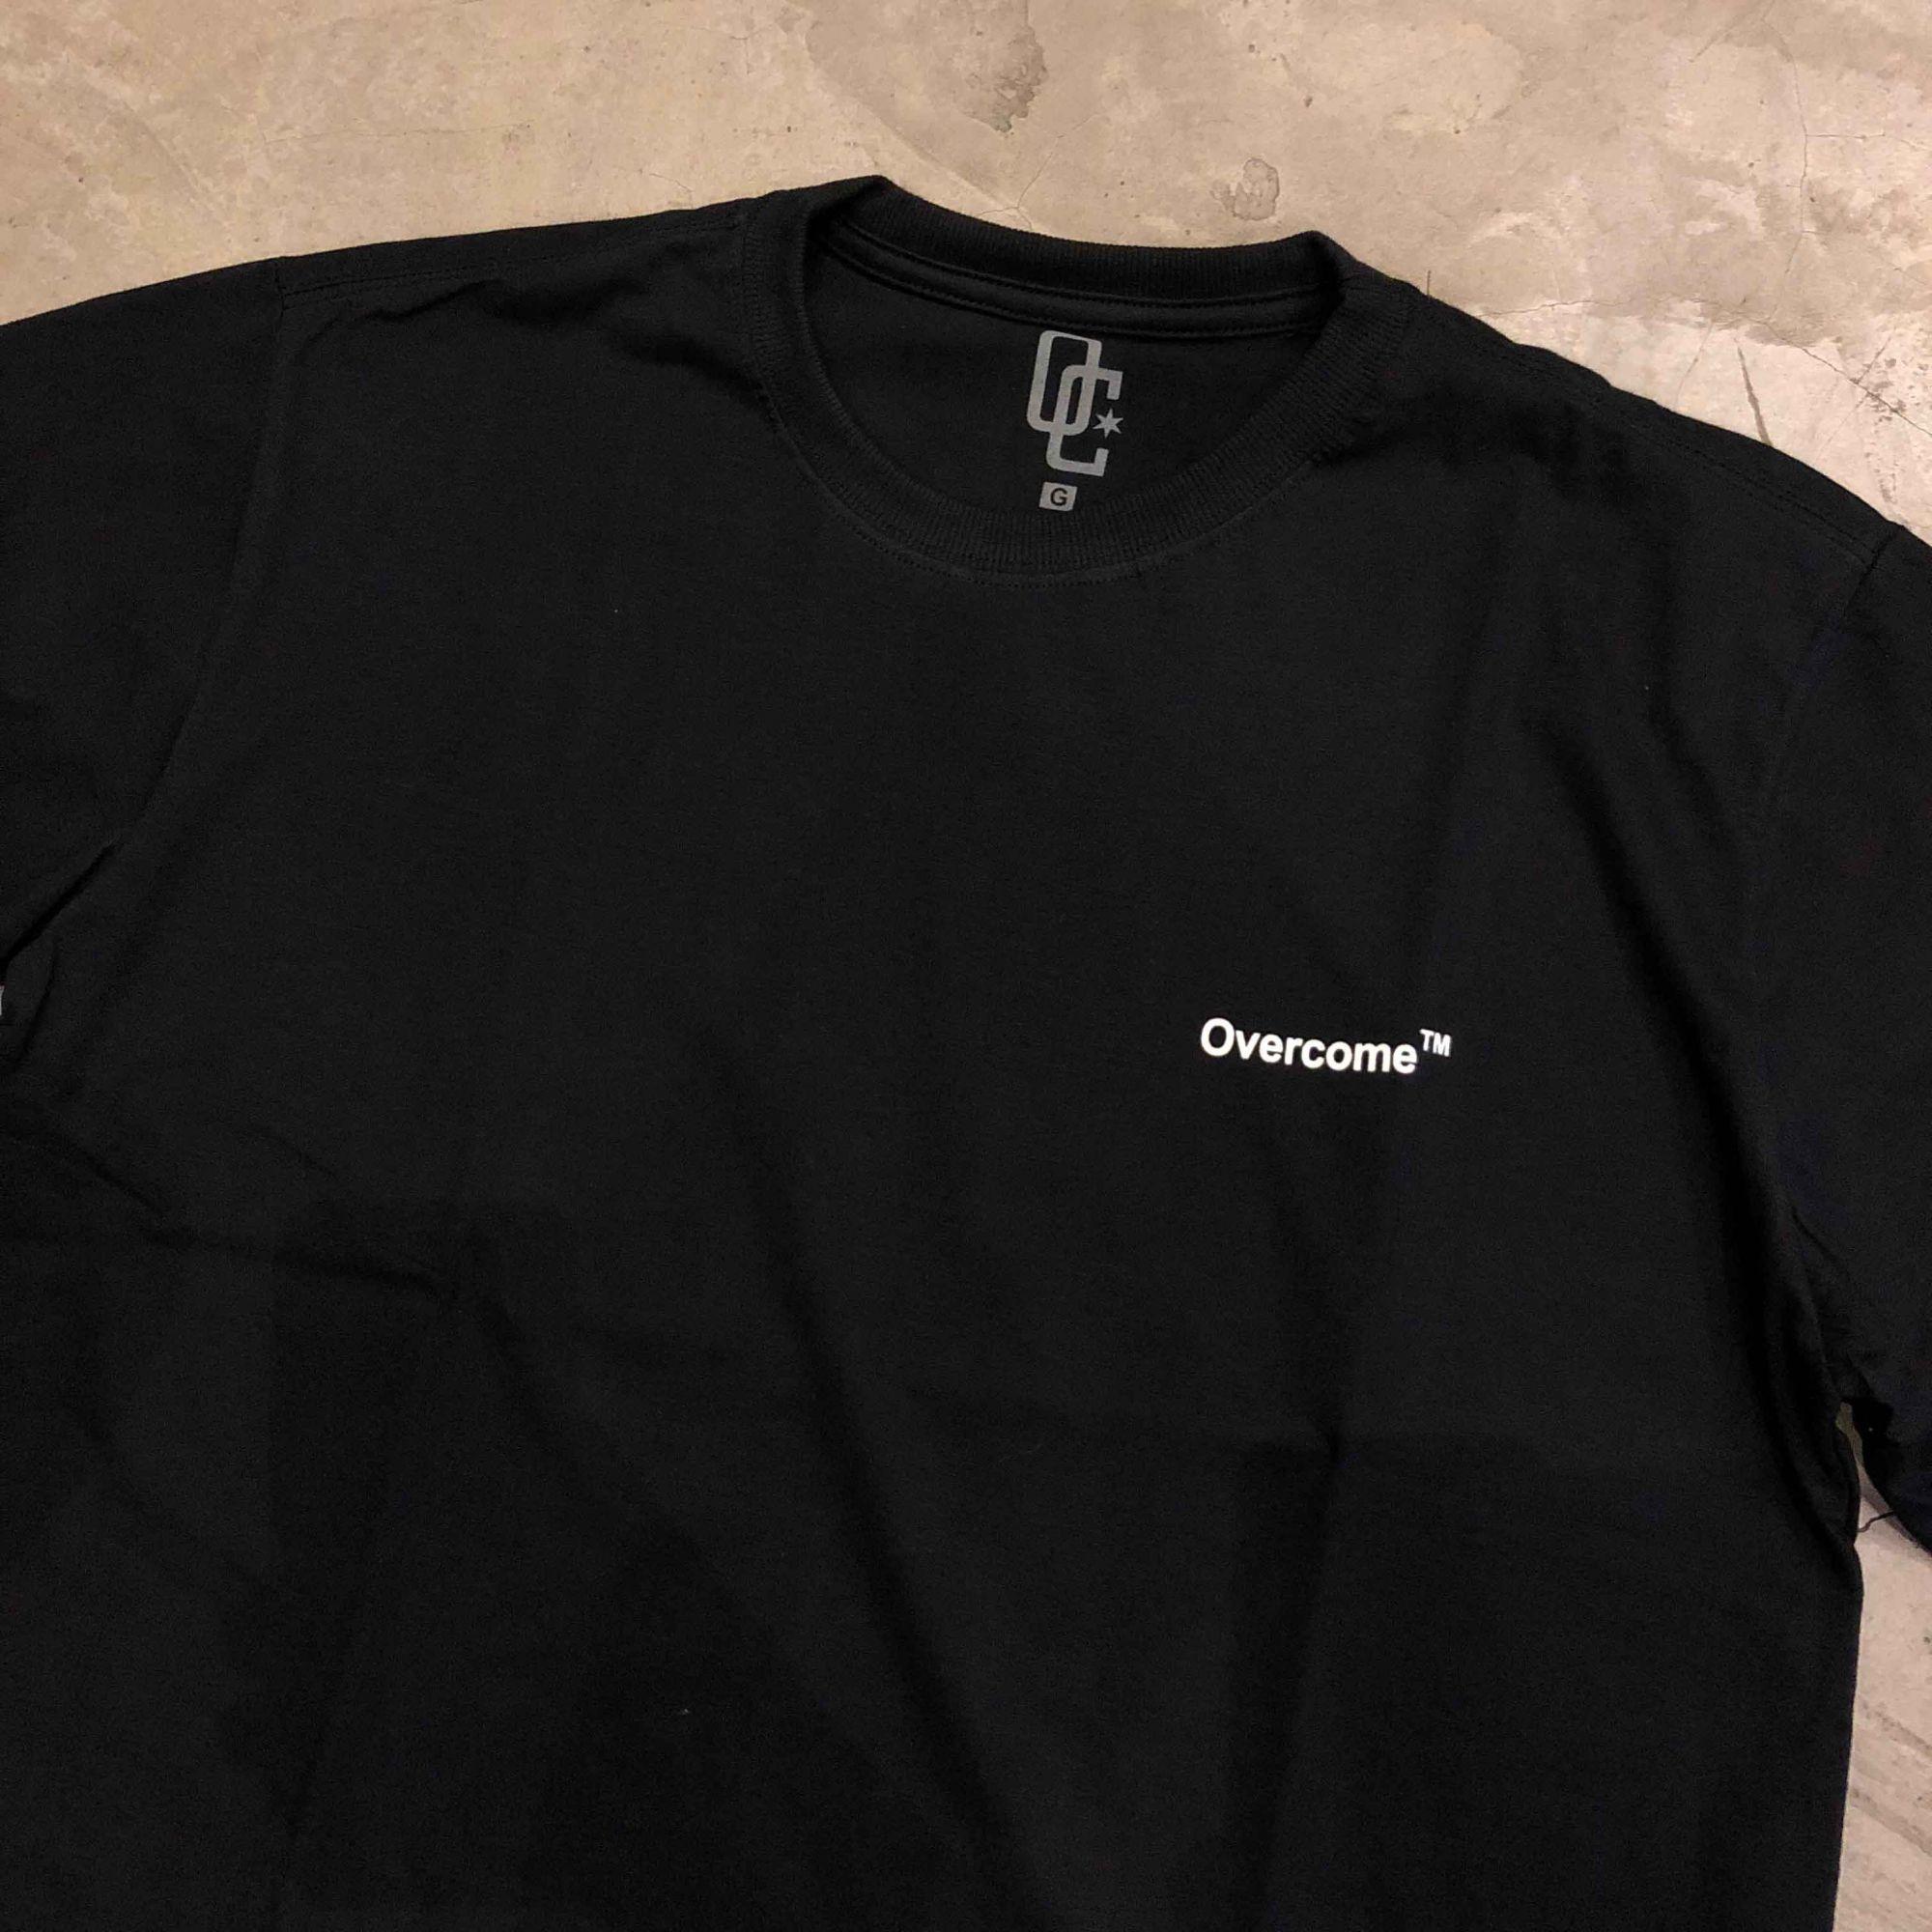 826877aaf Camiseta Overcome Co